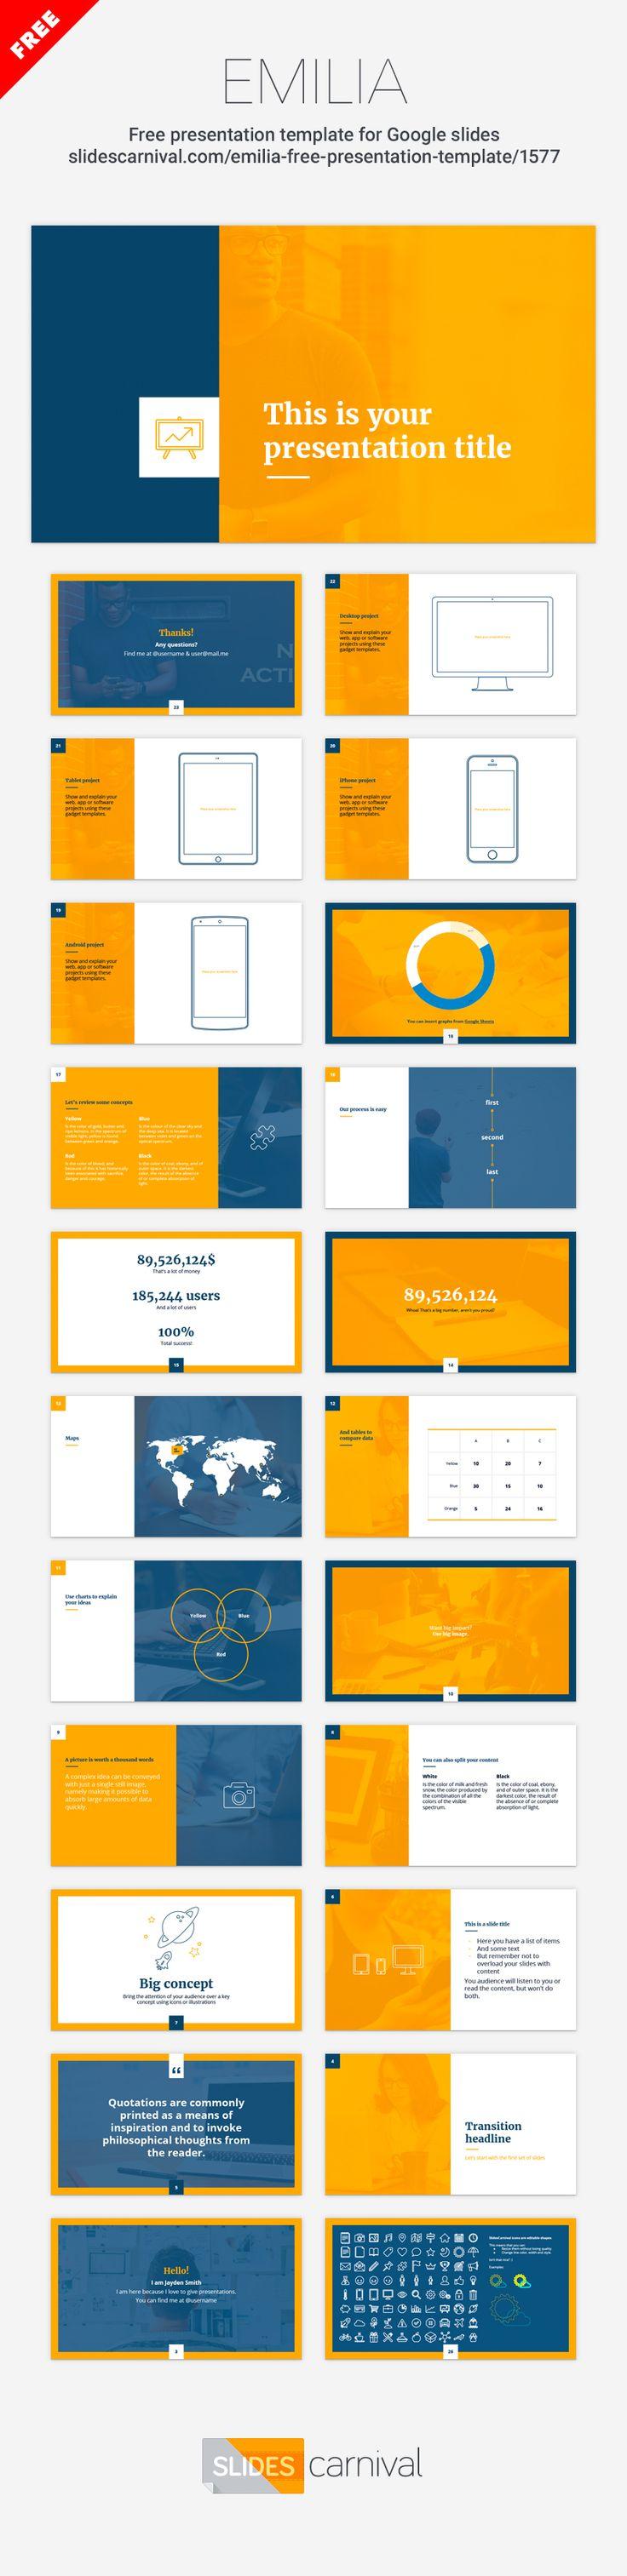 62 best images about free presentation templates on for Google prasentationen designs